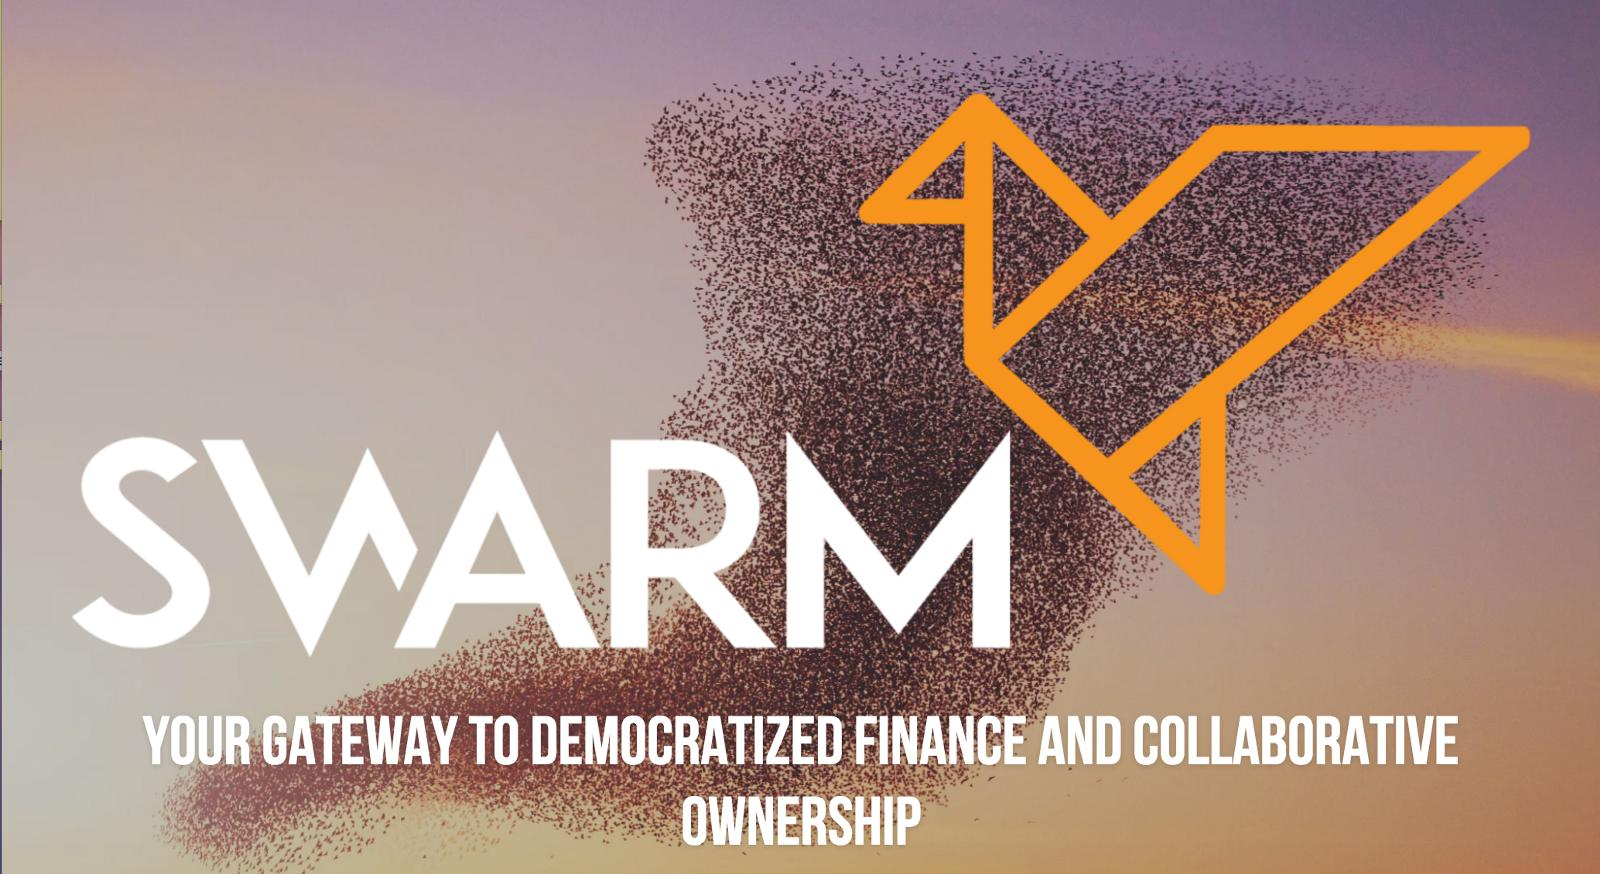 swarm挖矿如何参与?bzz挖矿节点哪里有?